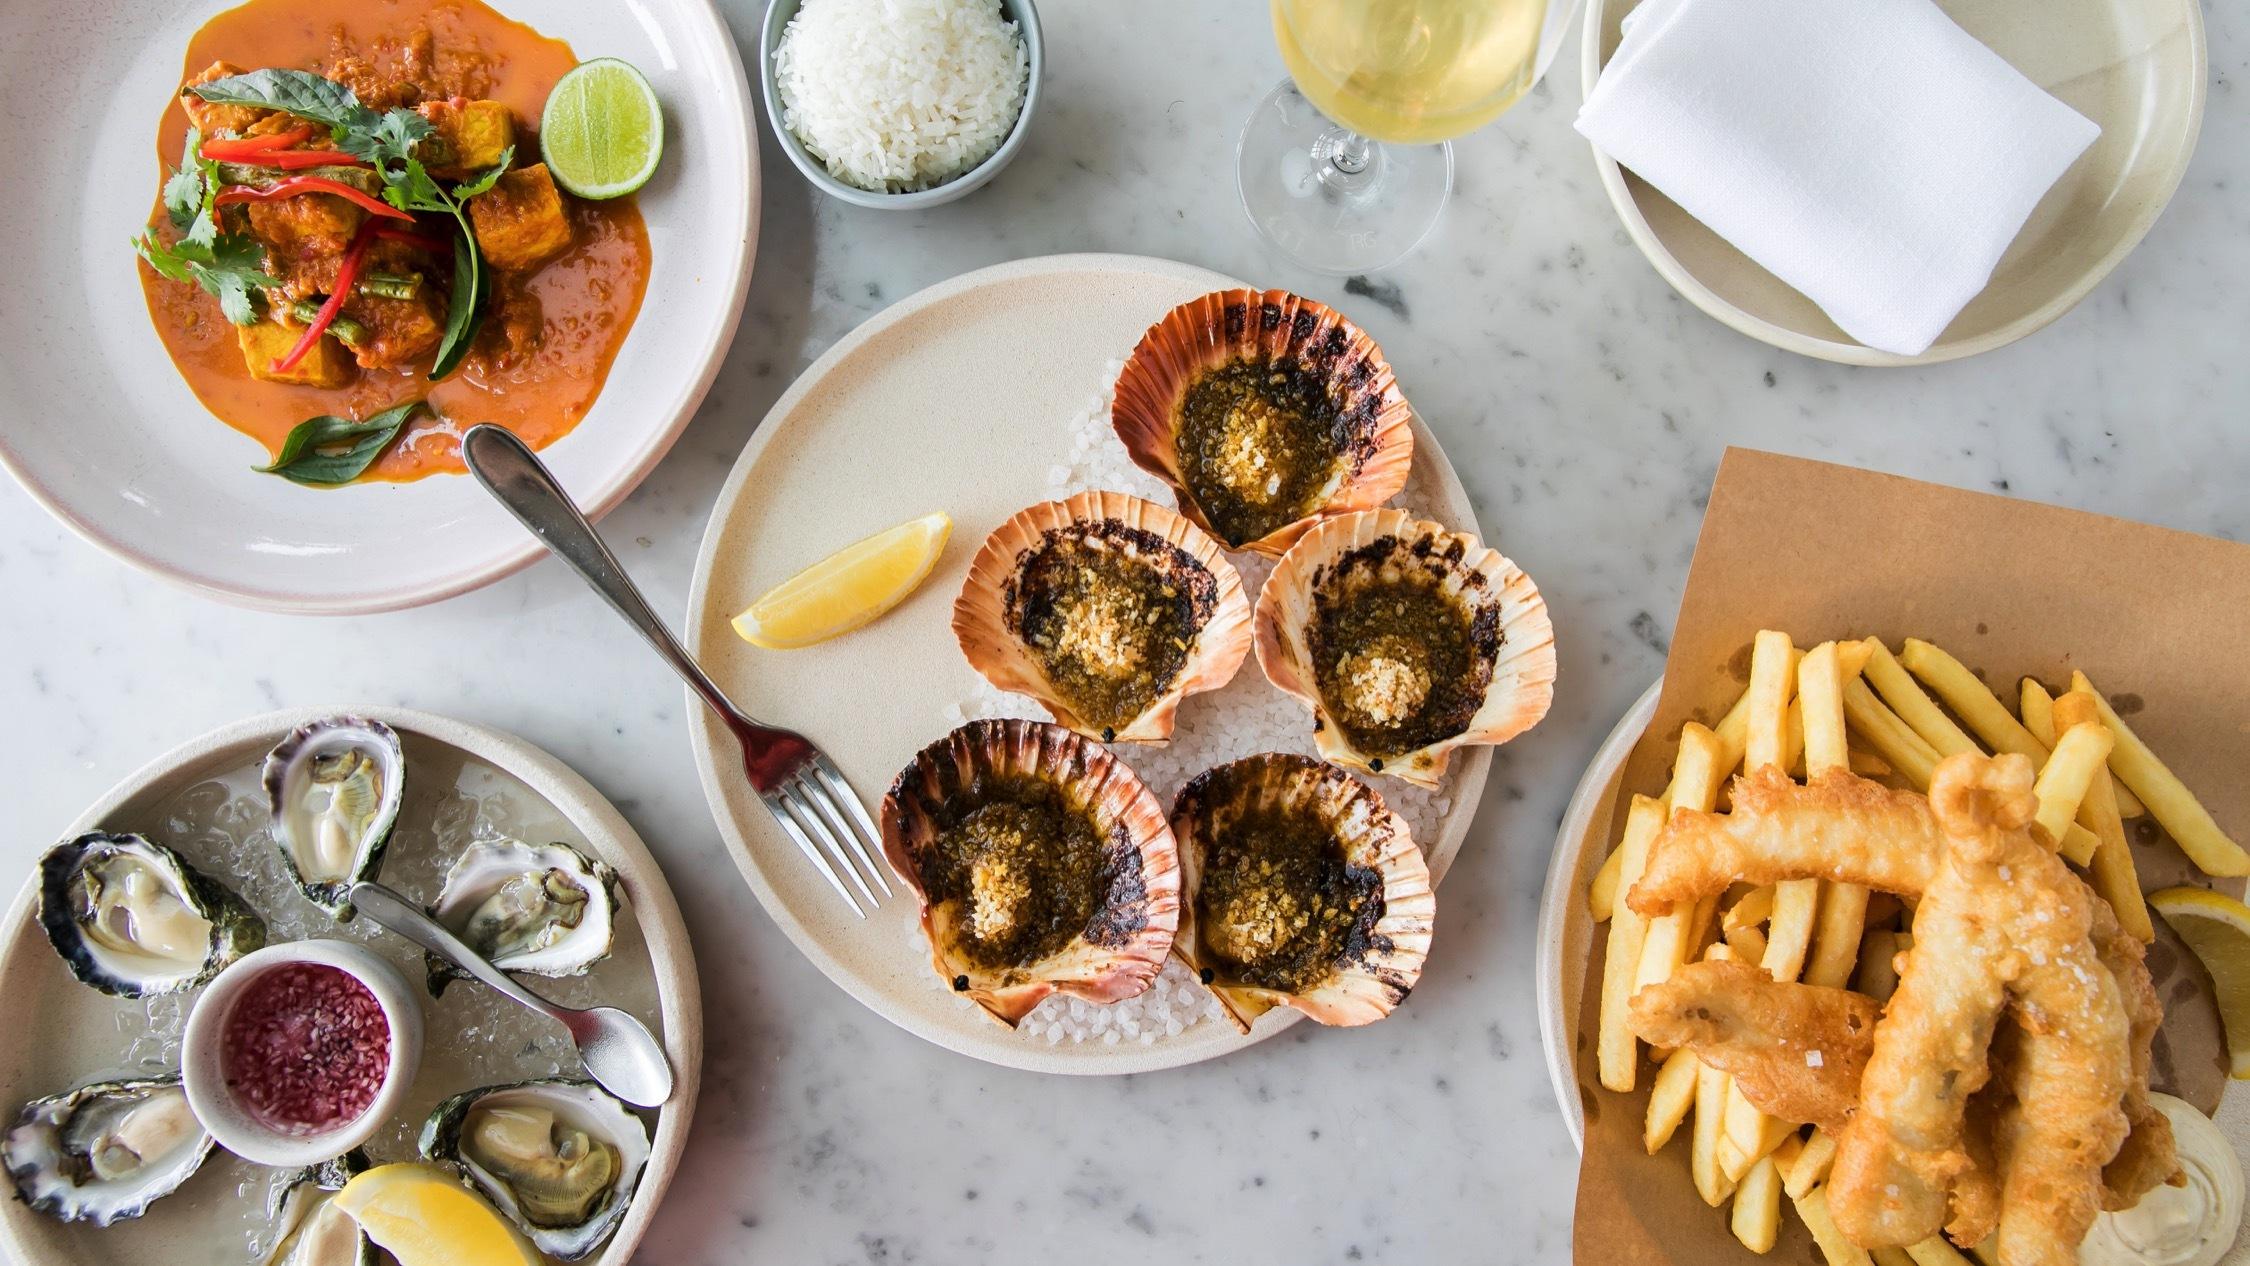 Table with plates of food at North Bondi Fish